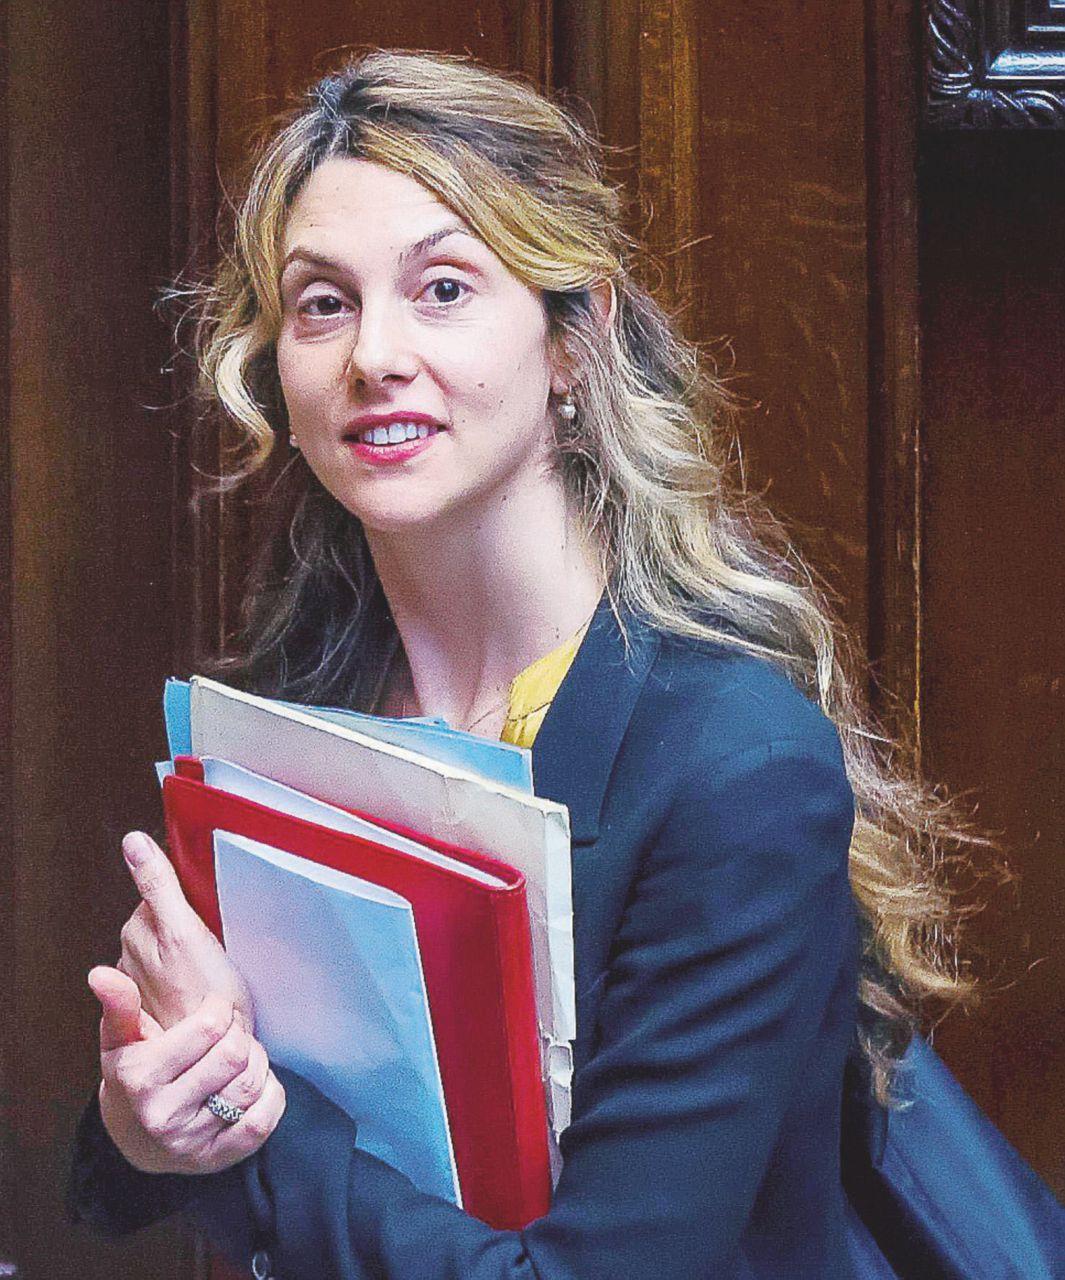 Tesi copiata all'Imt, tenuta segreta l'indagine che salva Marianna Madia